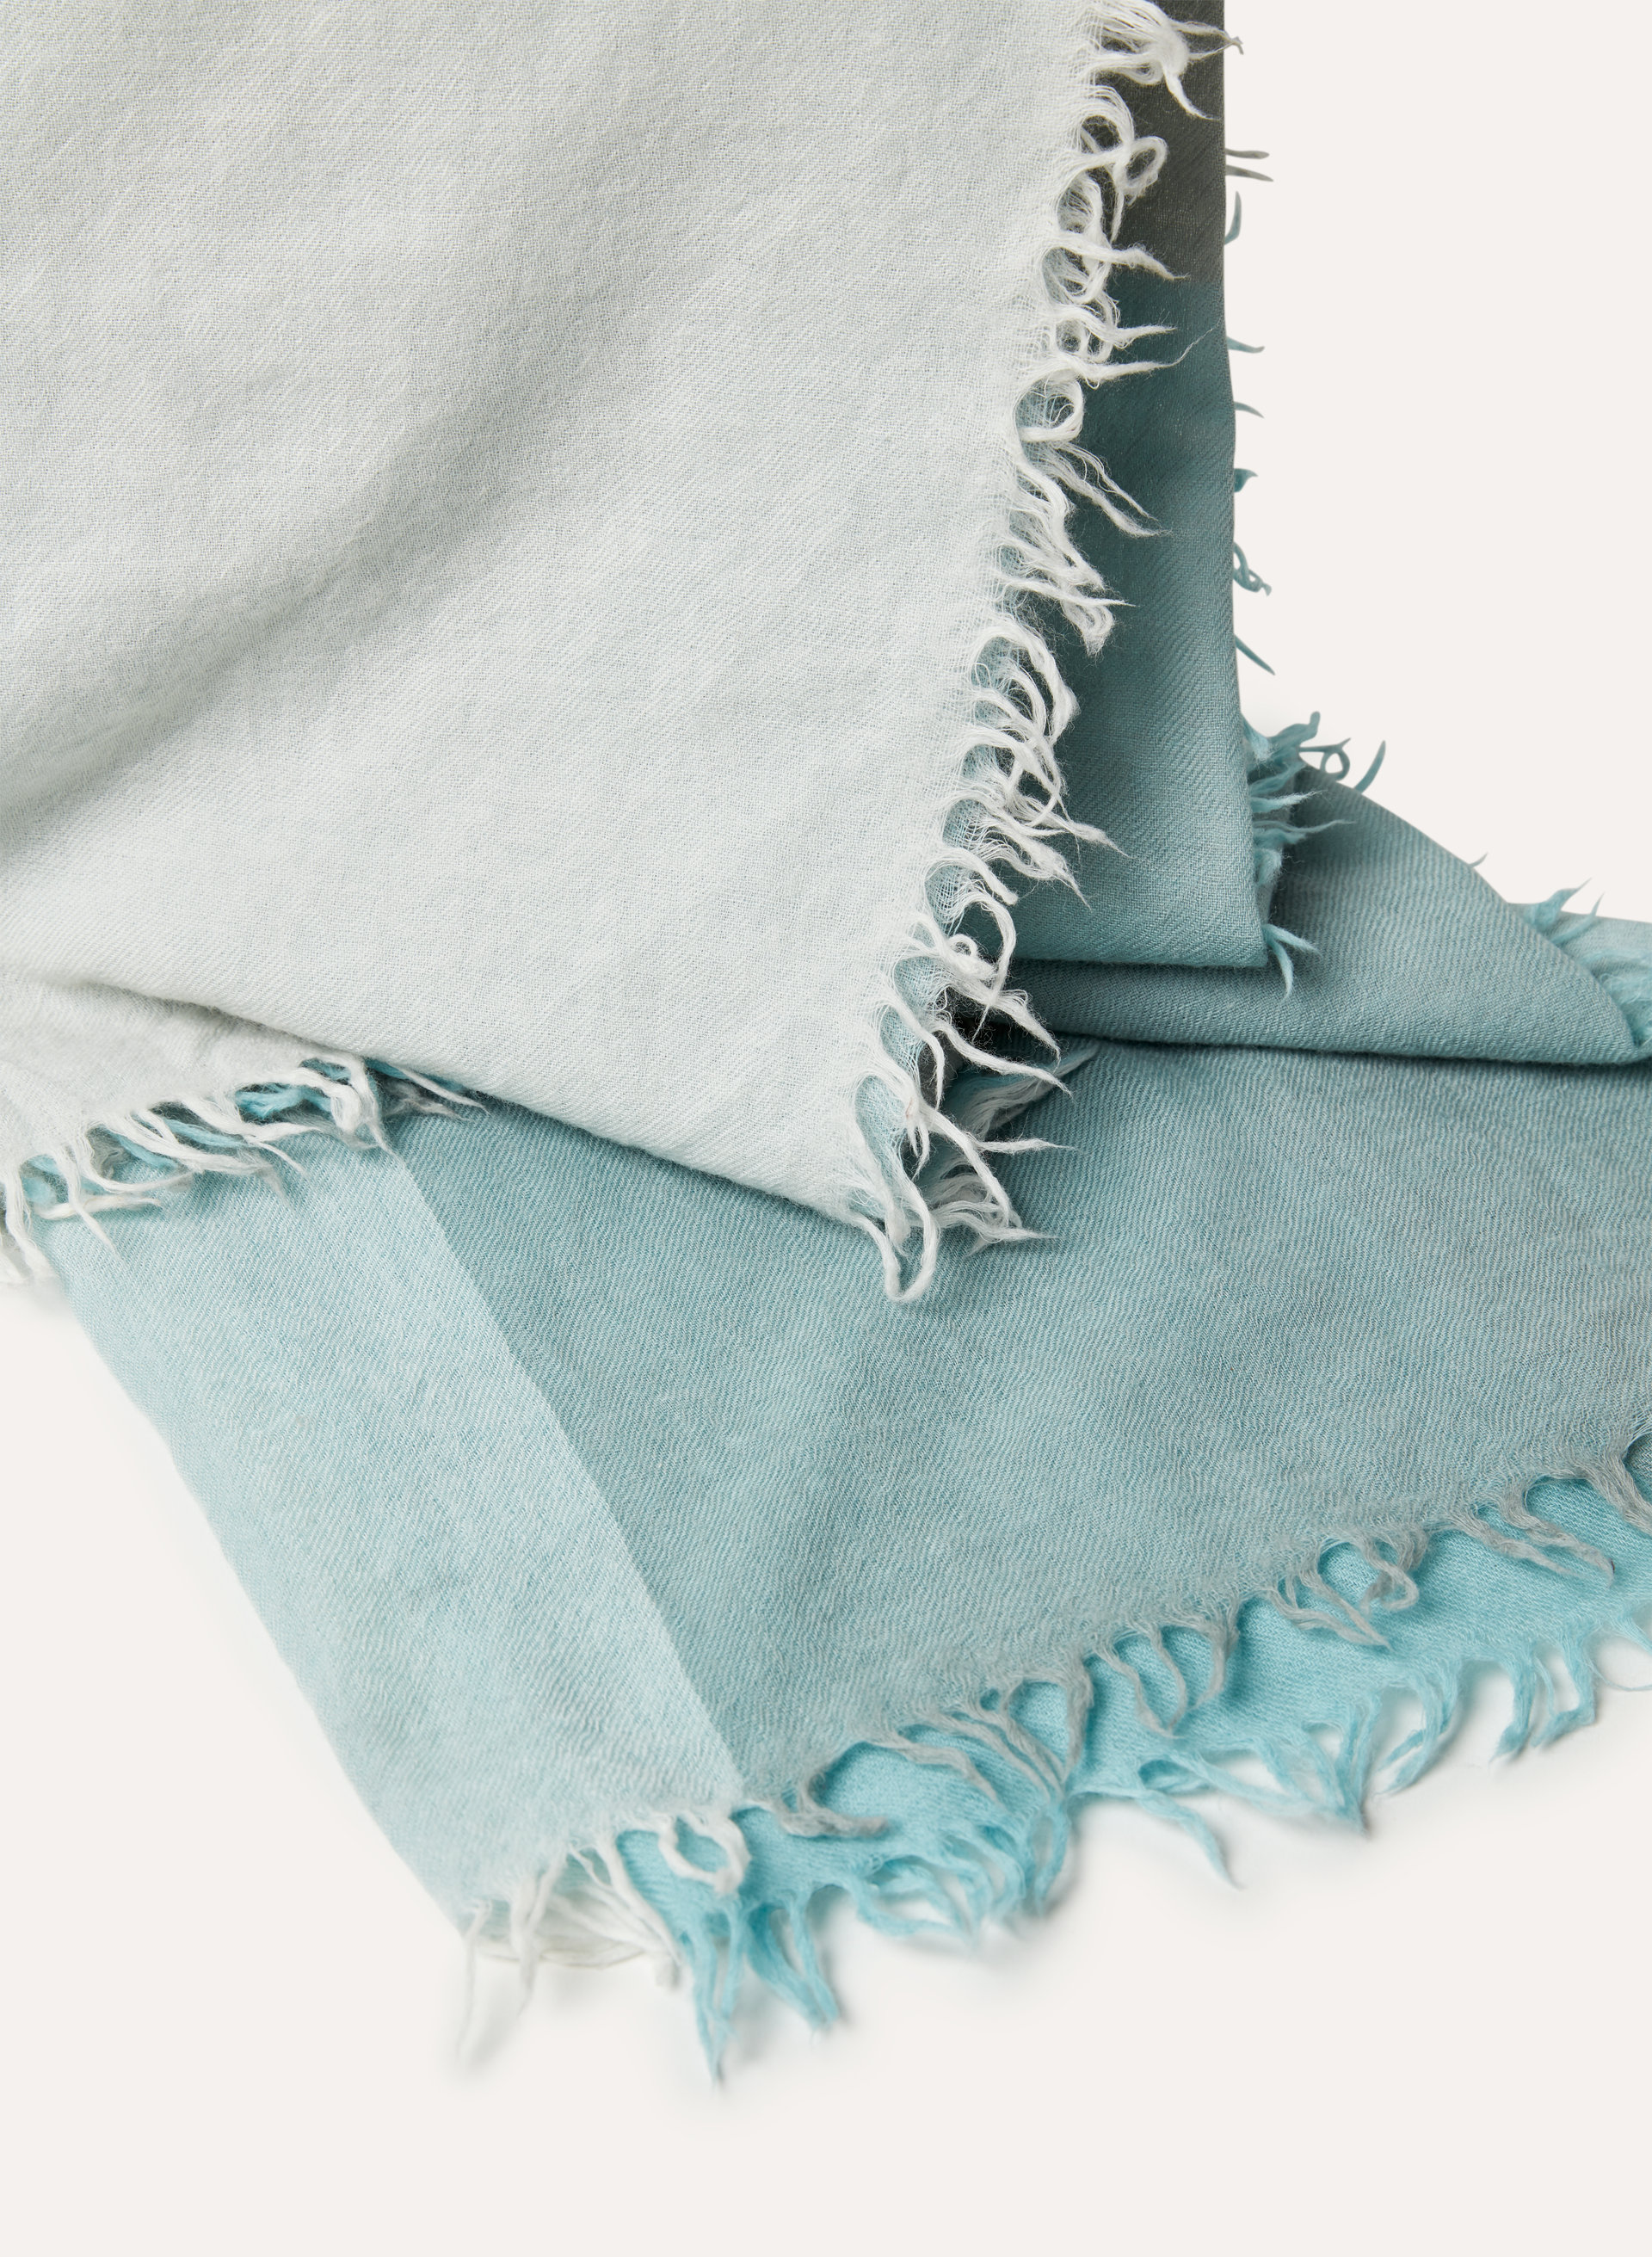 aa27018b7fe4 COLOUR BLANKET SCARF - Wool blanket scarf